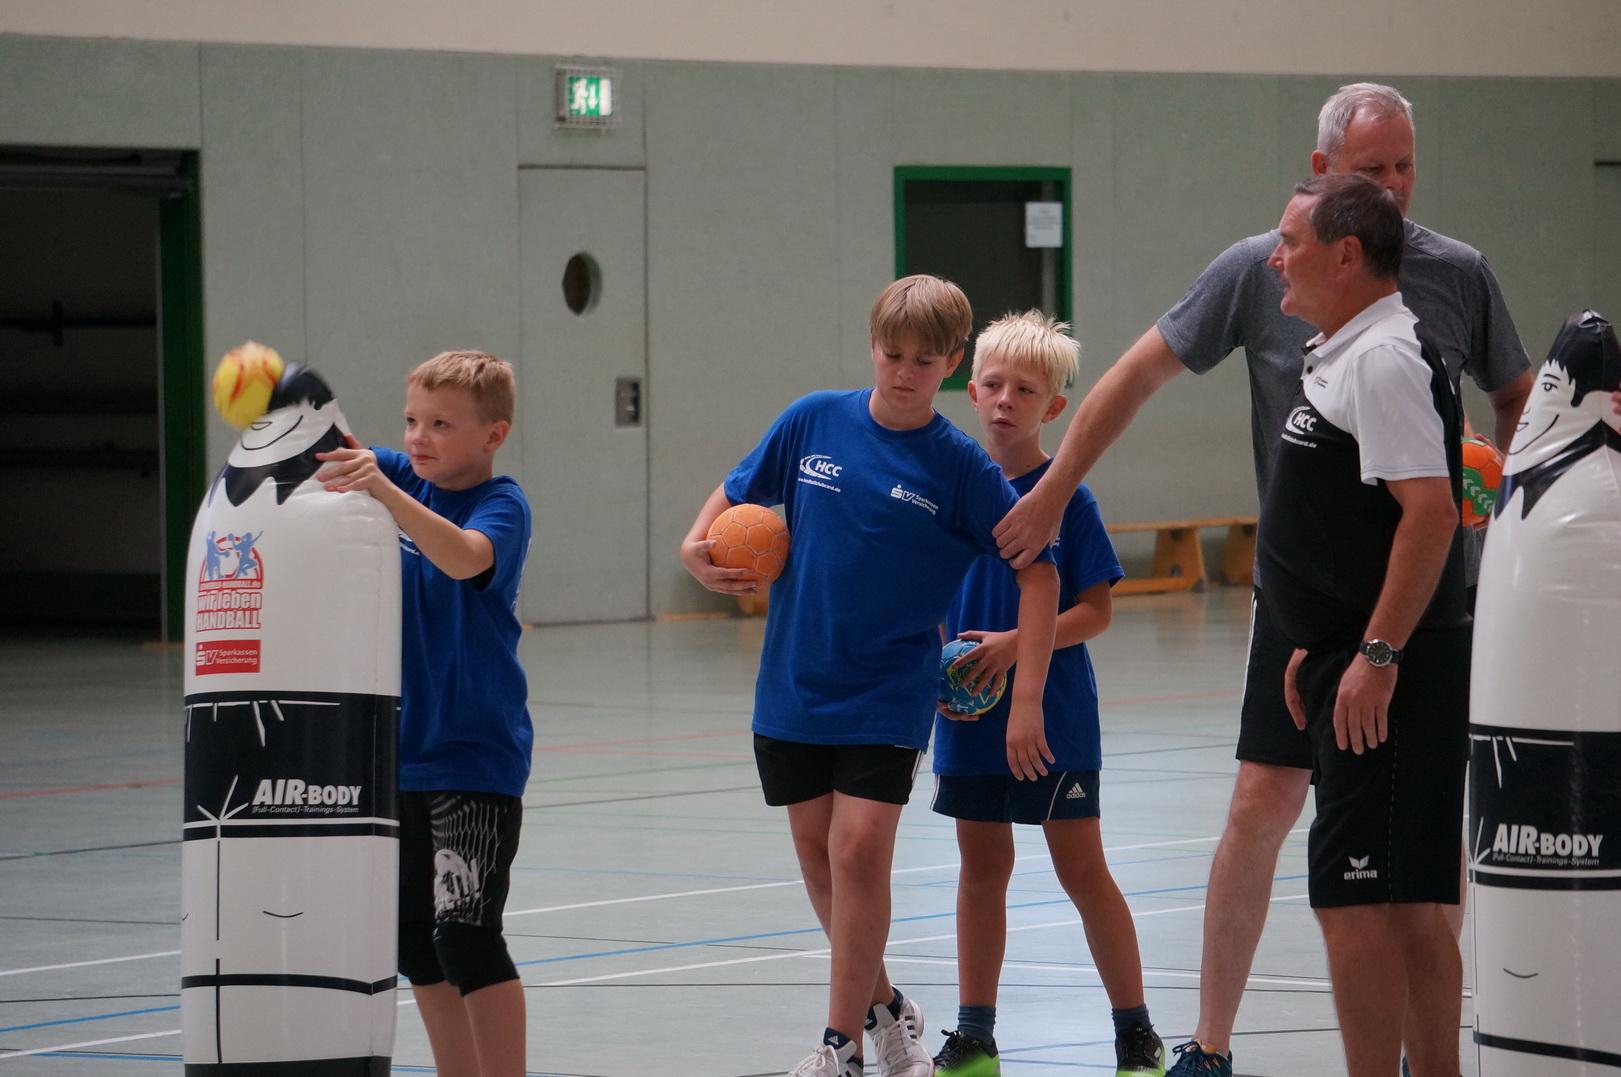 201808_Handballcamp_SDH_MG_226w